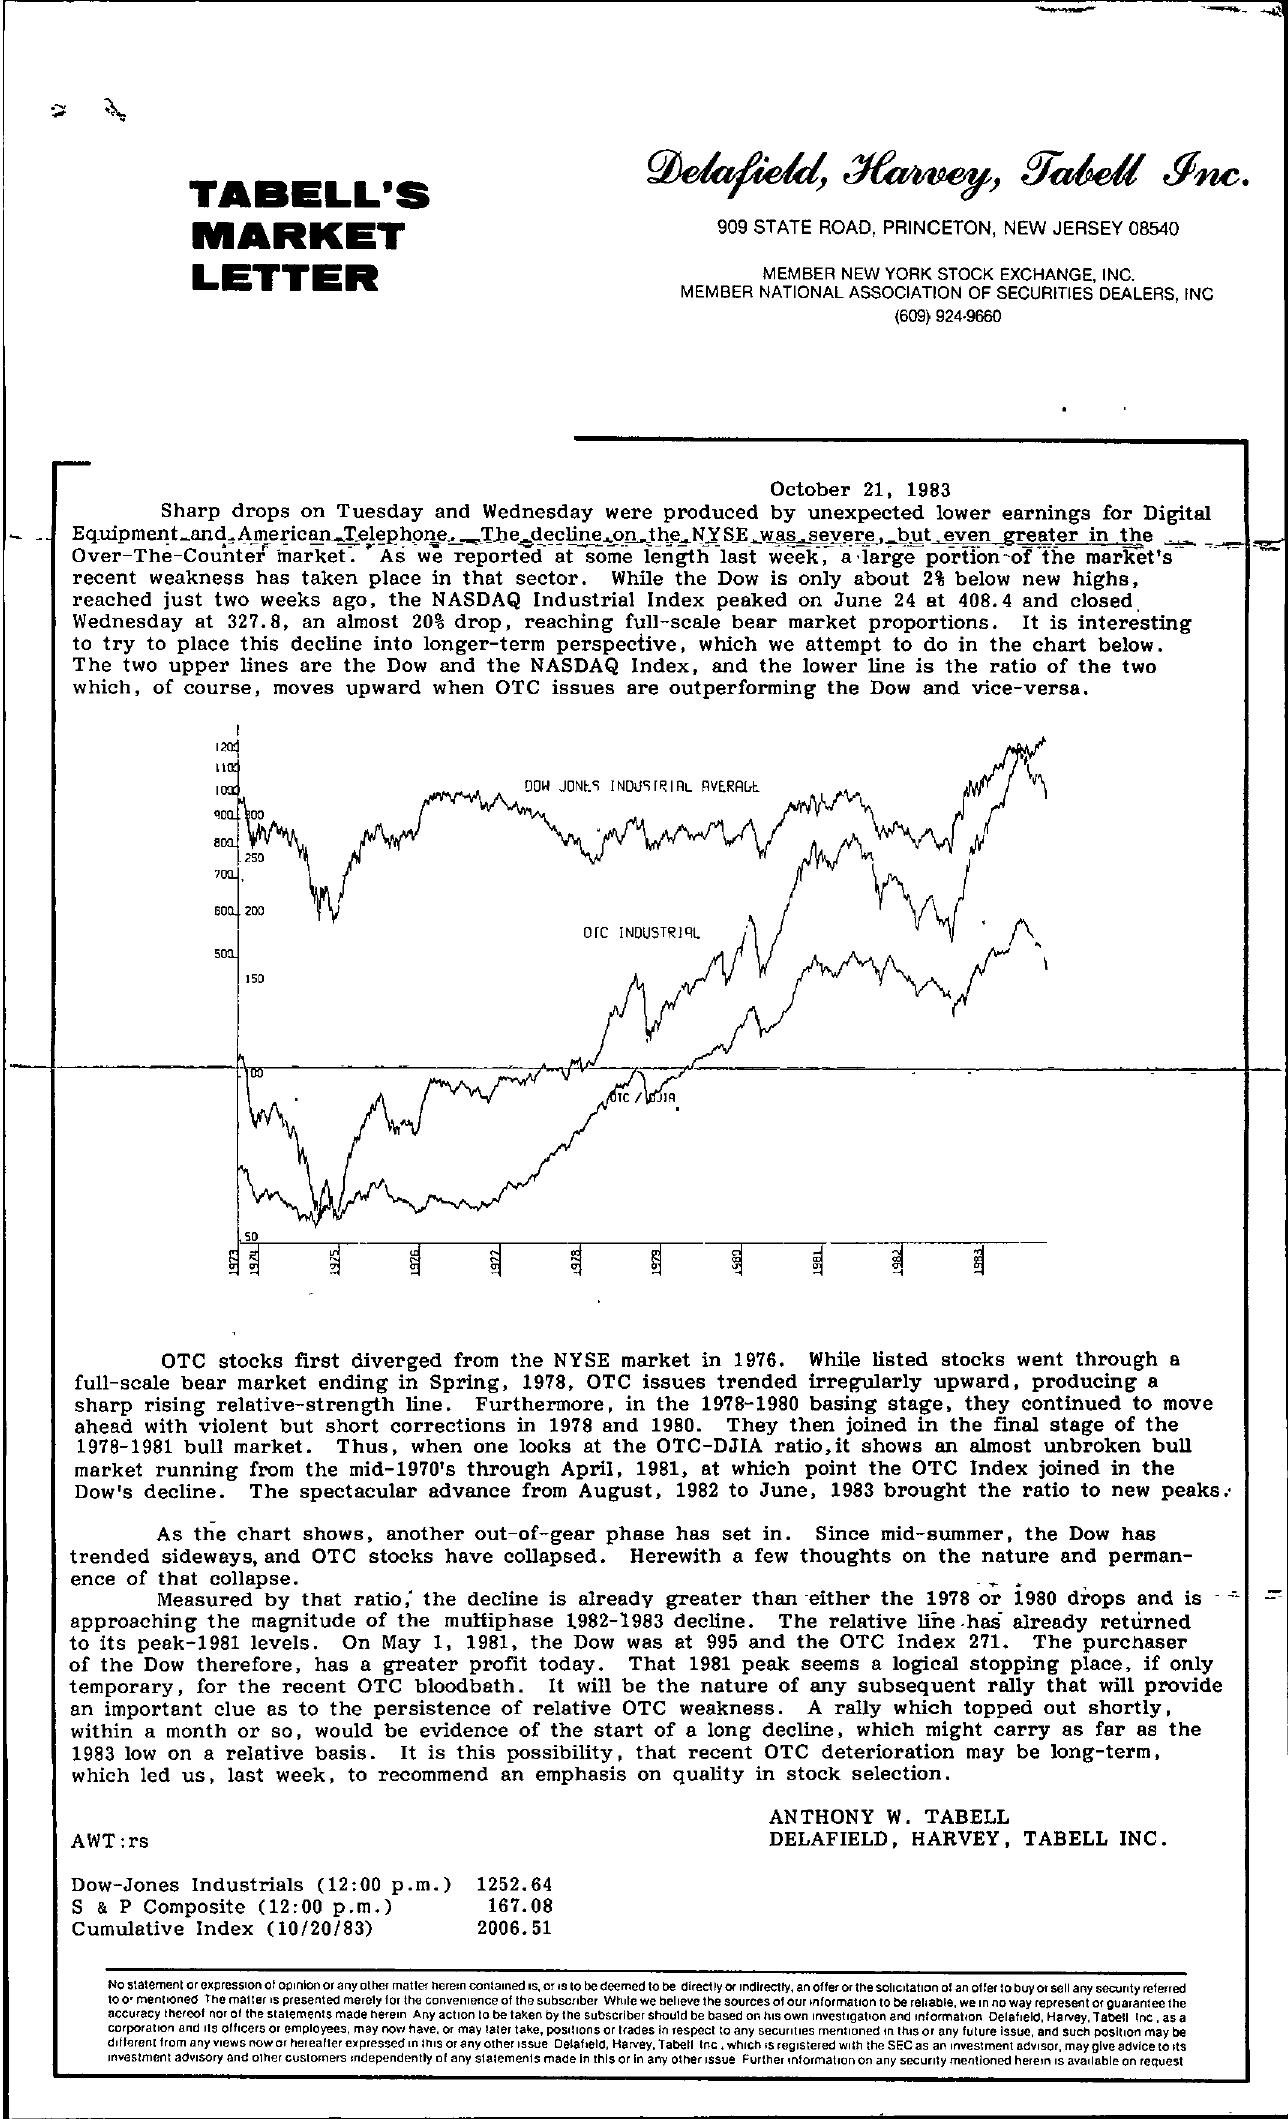 Tabell's Market Letter - October 21, 1983